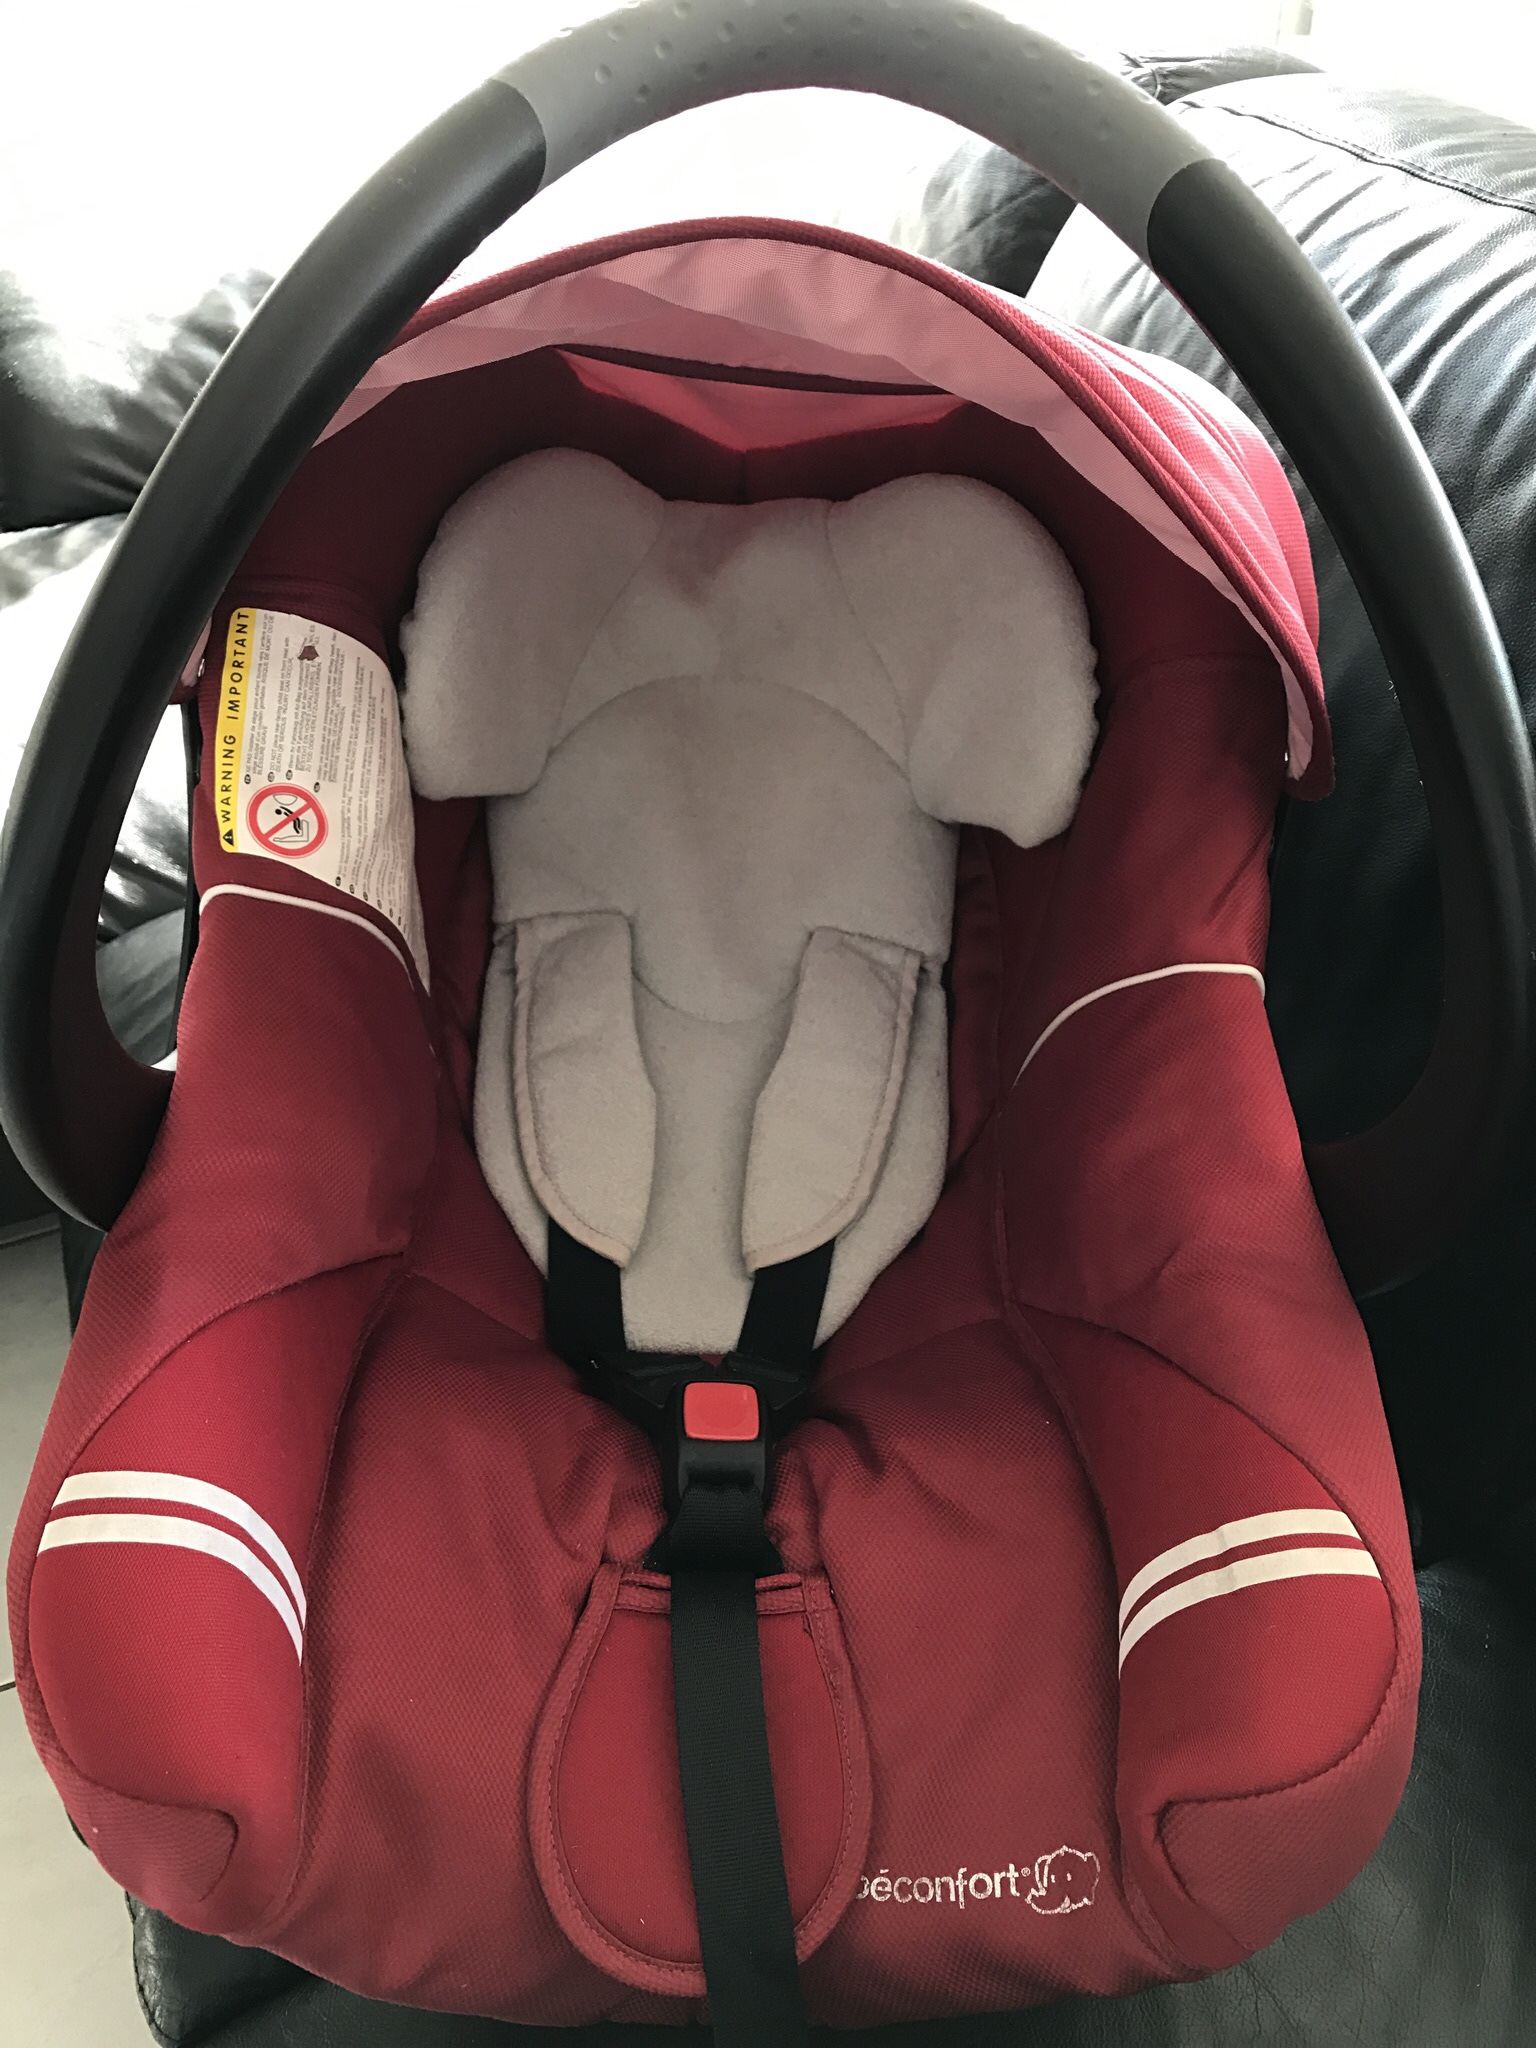 vends siège auto creatifix bebe confort rouge + embrase 70 Metz (57)